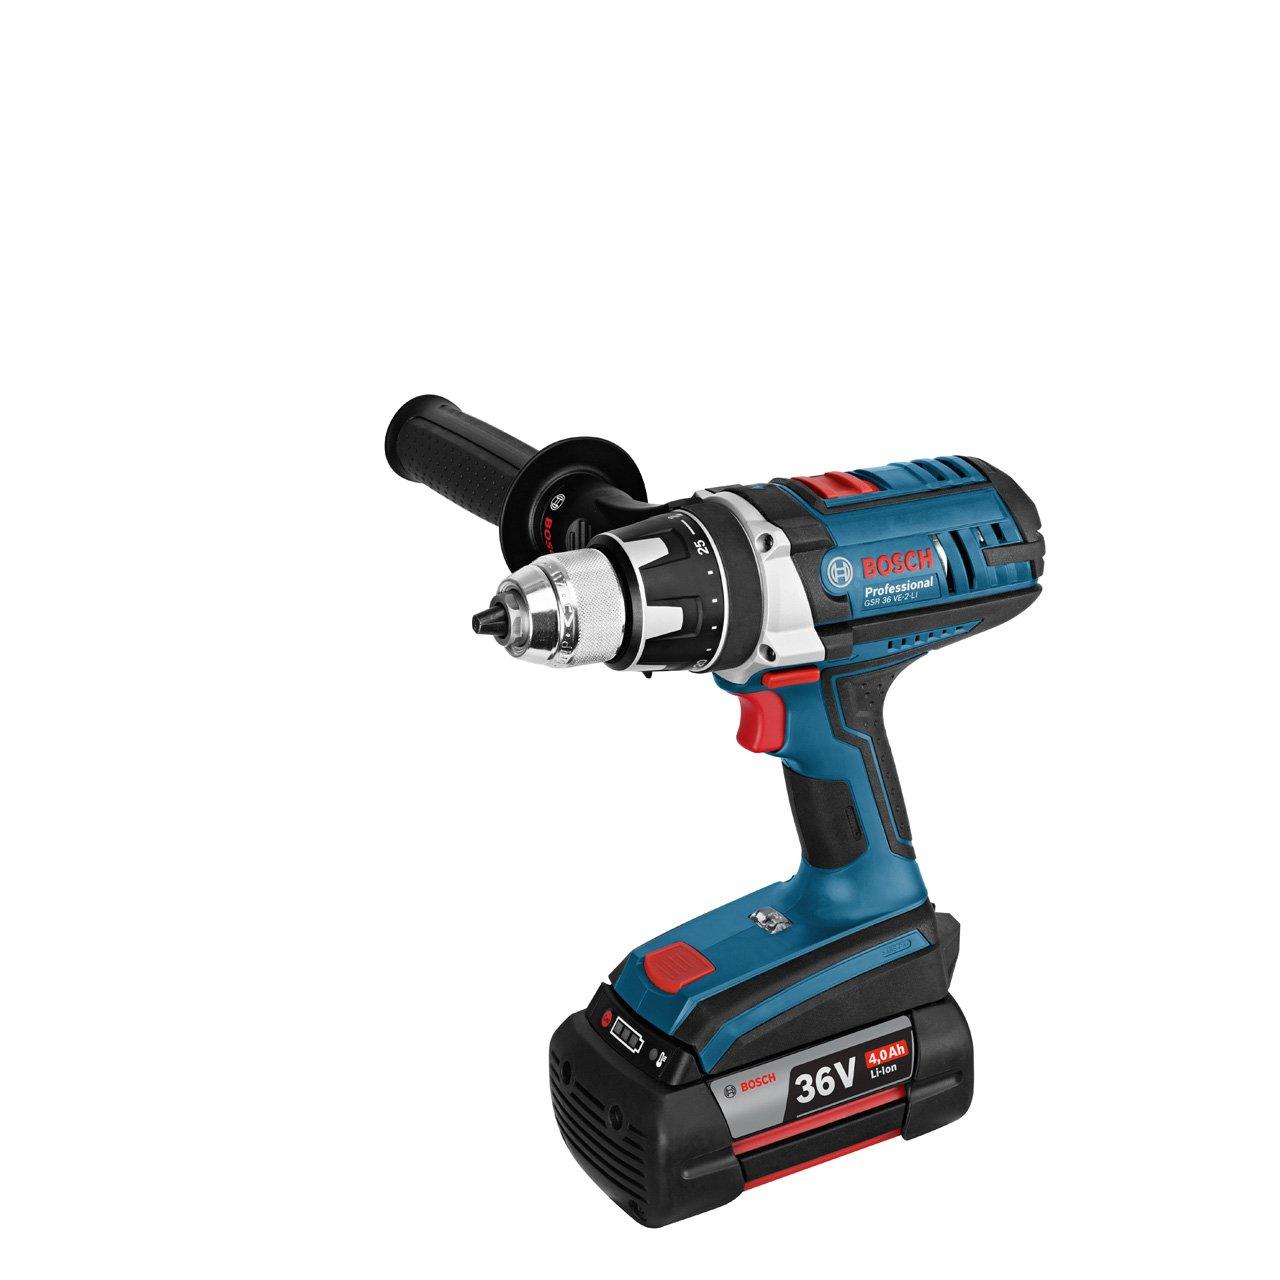 Bosch Professional GSR 36 VE-2-LI